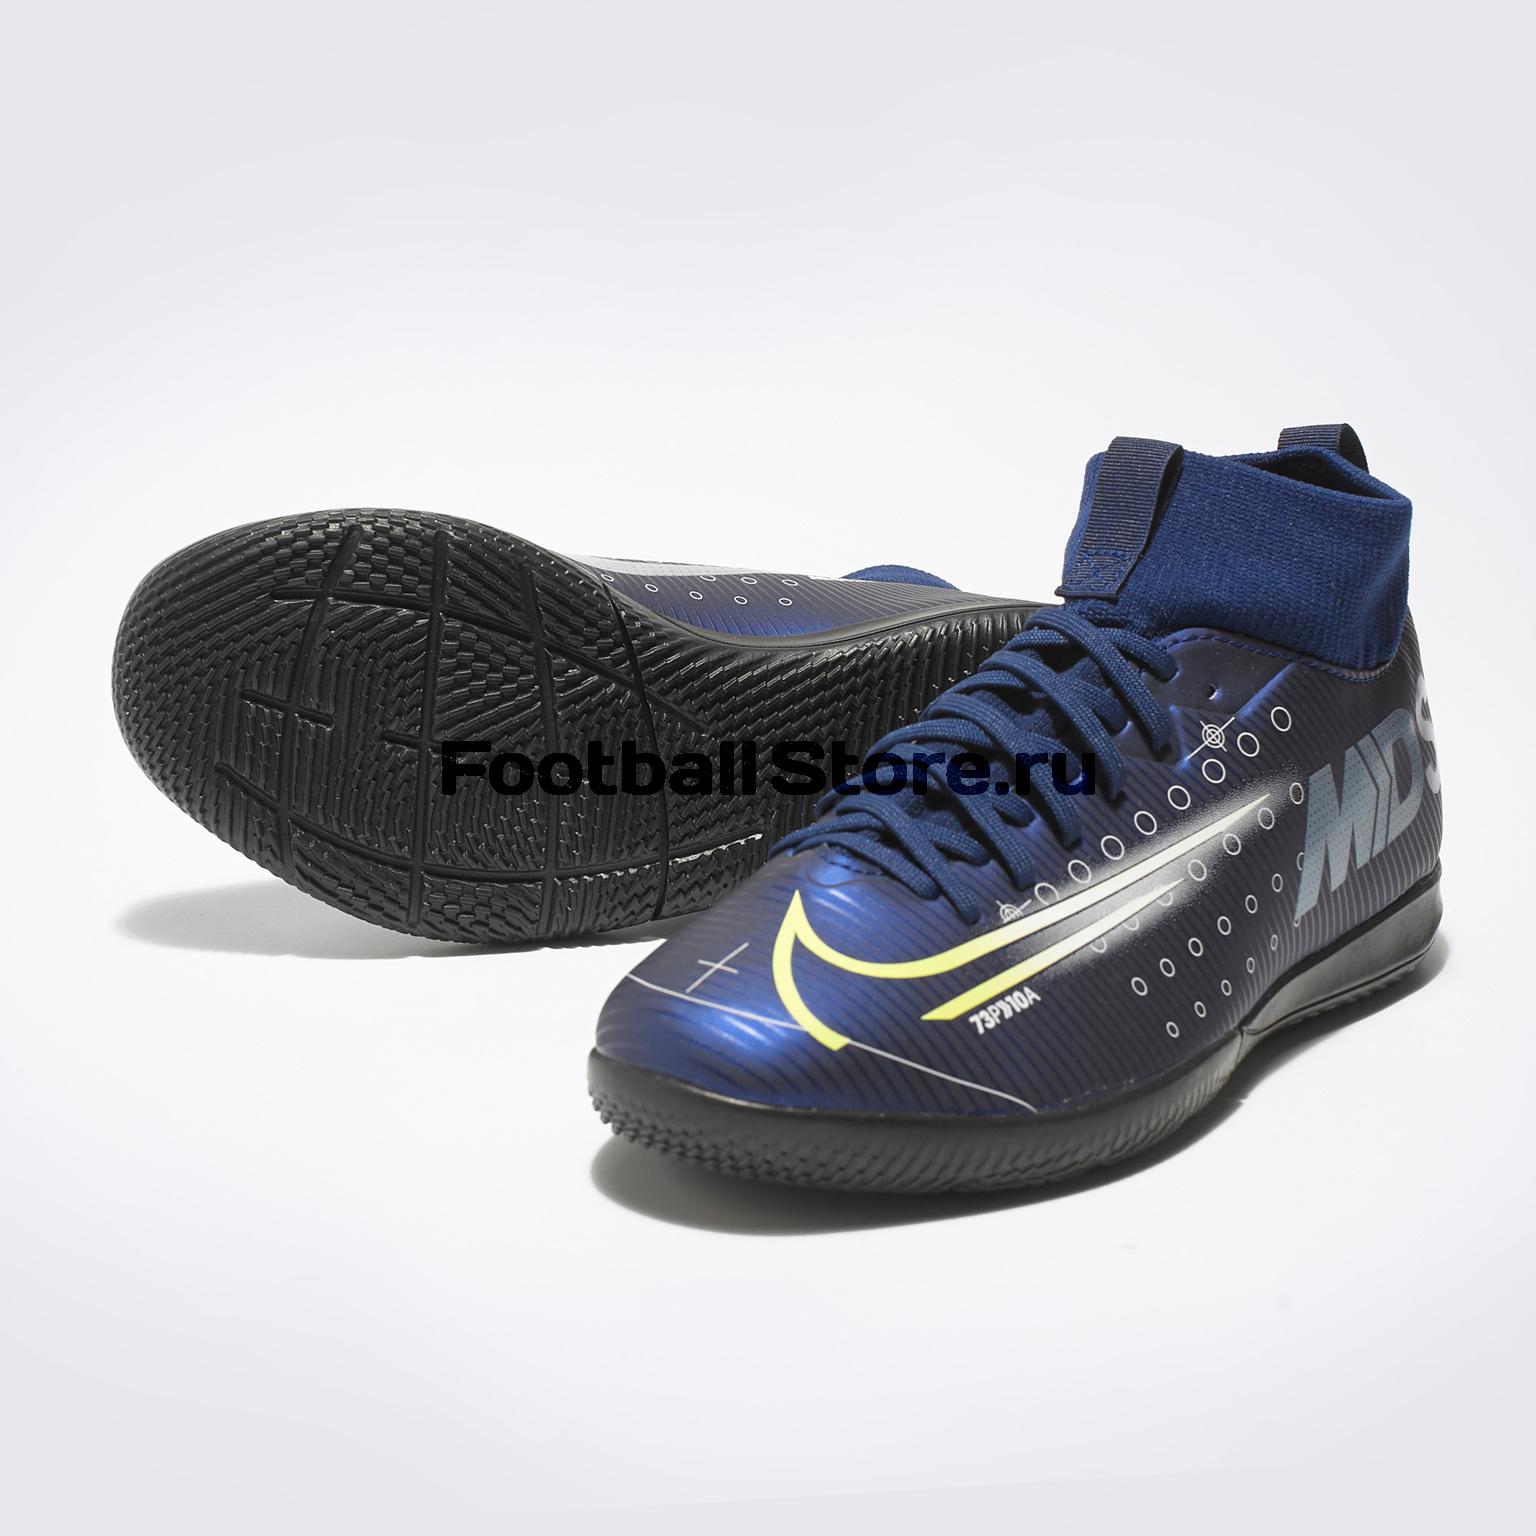 Футзалки детские Nike Superfly 7 Academy MDS IC BQ5529-401 цена и фото